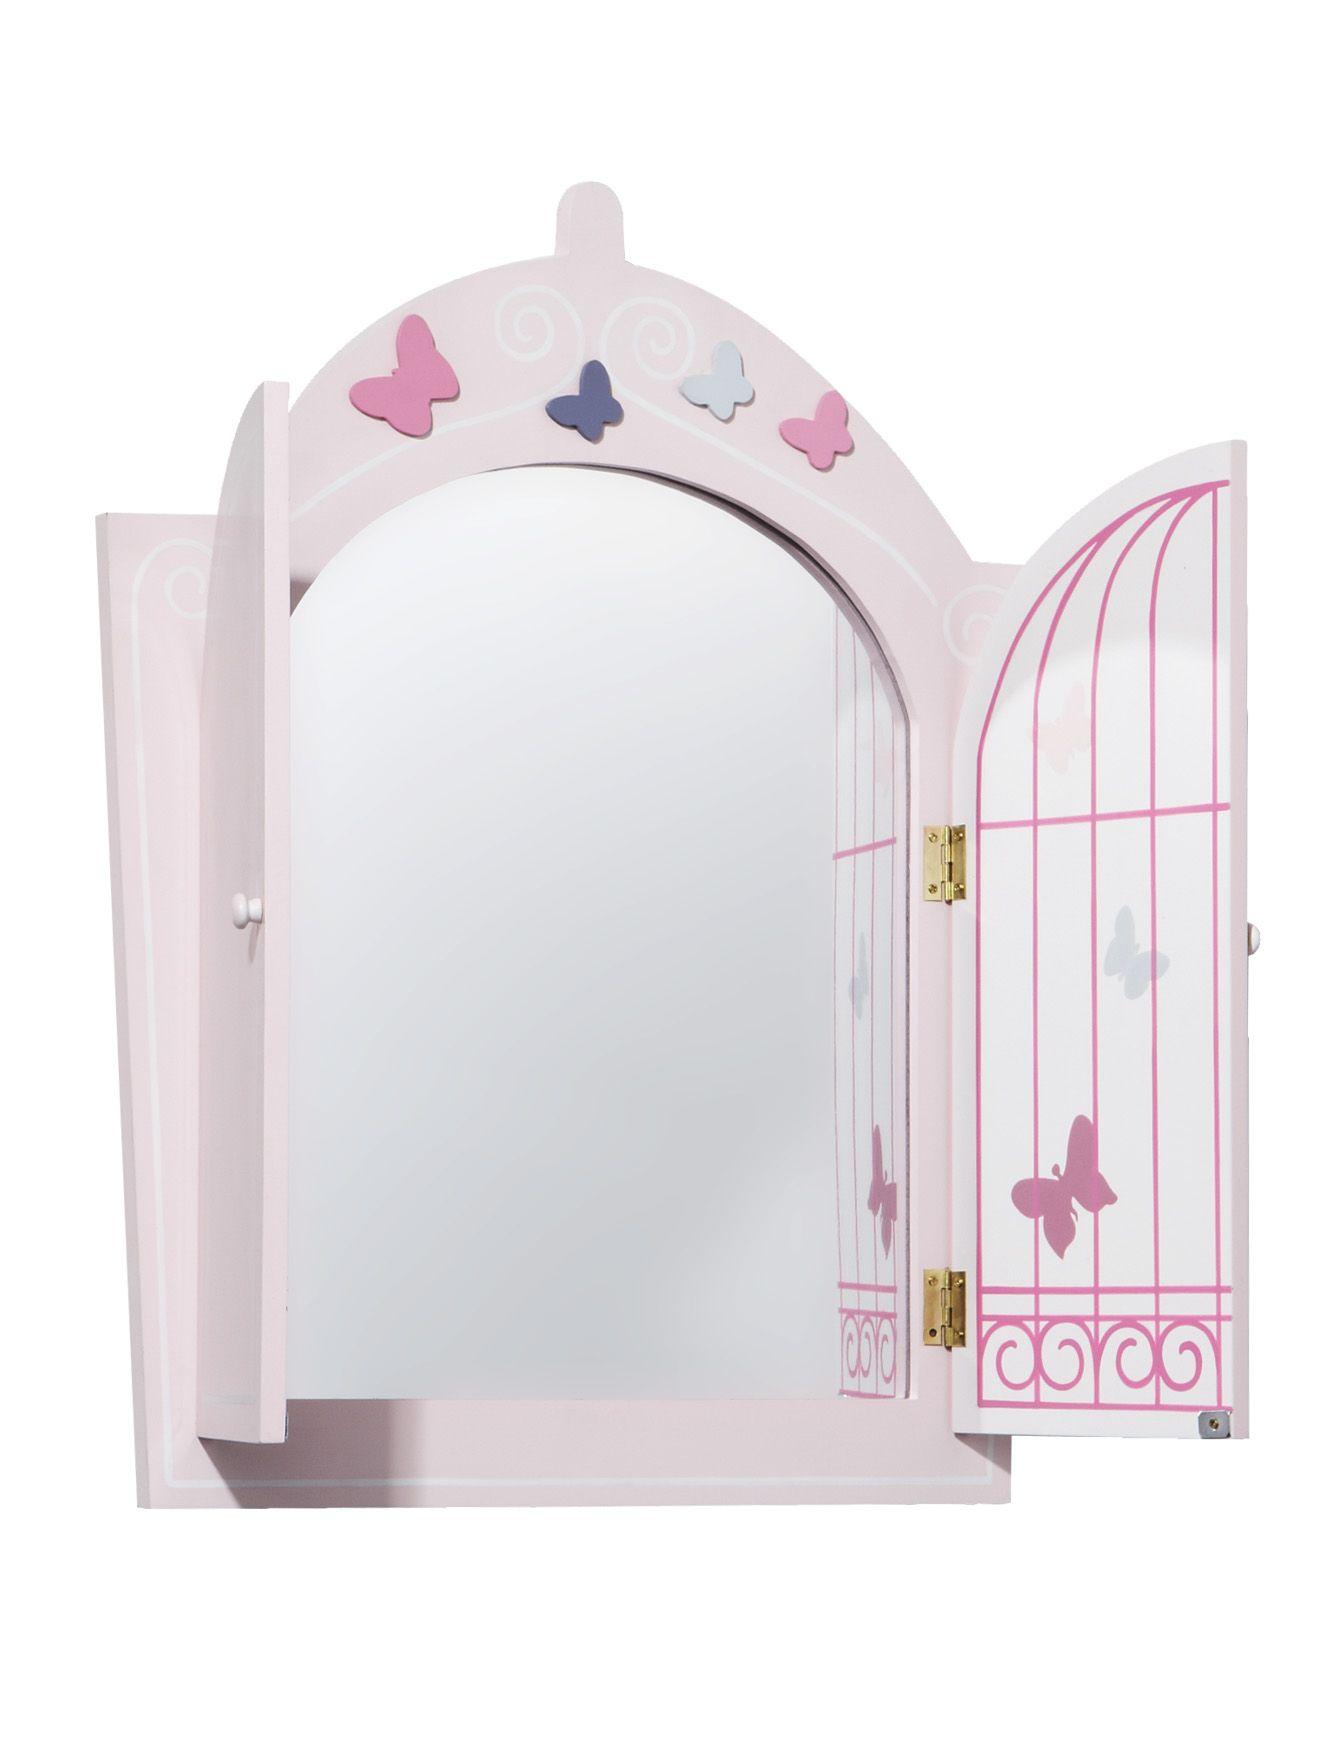 Kinderspiegel mit Schmetterlingen Kinderspiegel, Spiegel